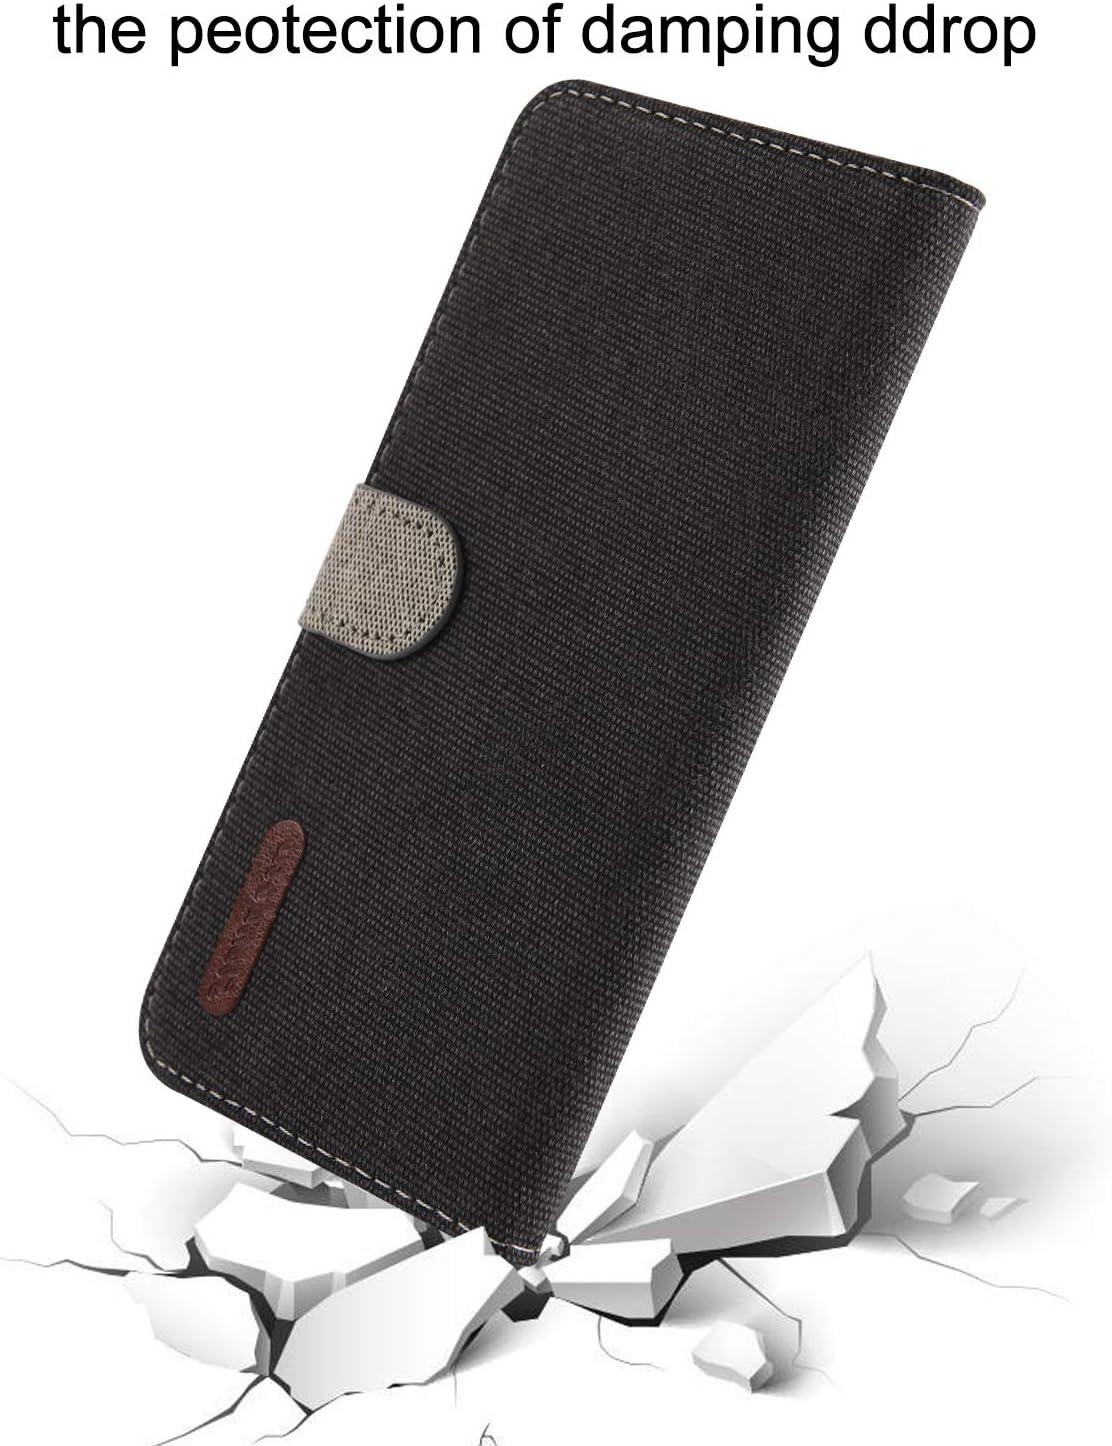 Plus H/ülle Glitzer Gesch/äft Wallet Flip H/ülle Samsung Galaxy S10 Huphant Compatible for Schutzh/ülle Samsung Galaxy S10 Rose rot Plus Brieftasche Handyh/ülle Einfarbig Klapph/ülle St/änder Kartenf/ächer